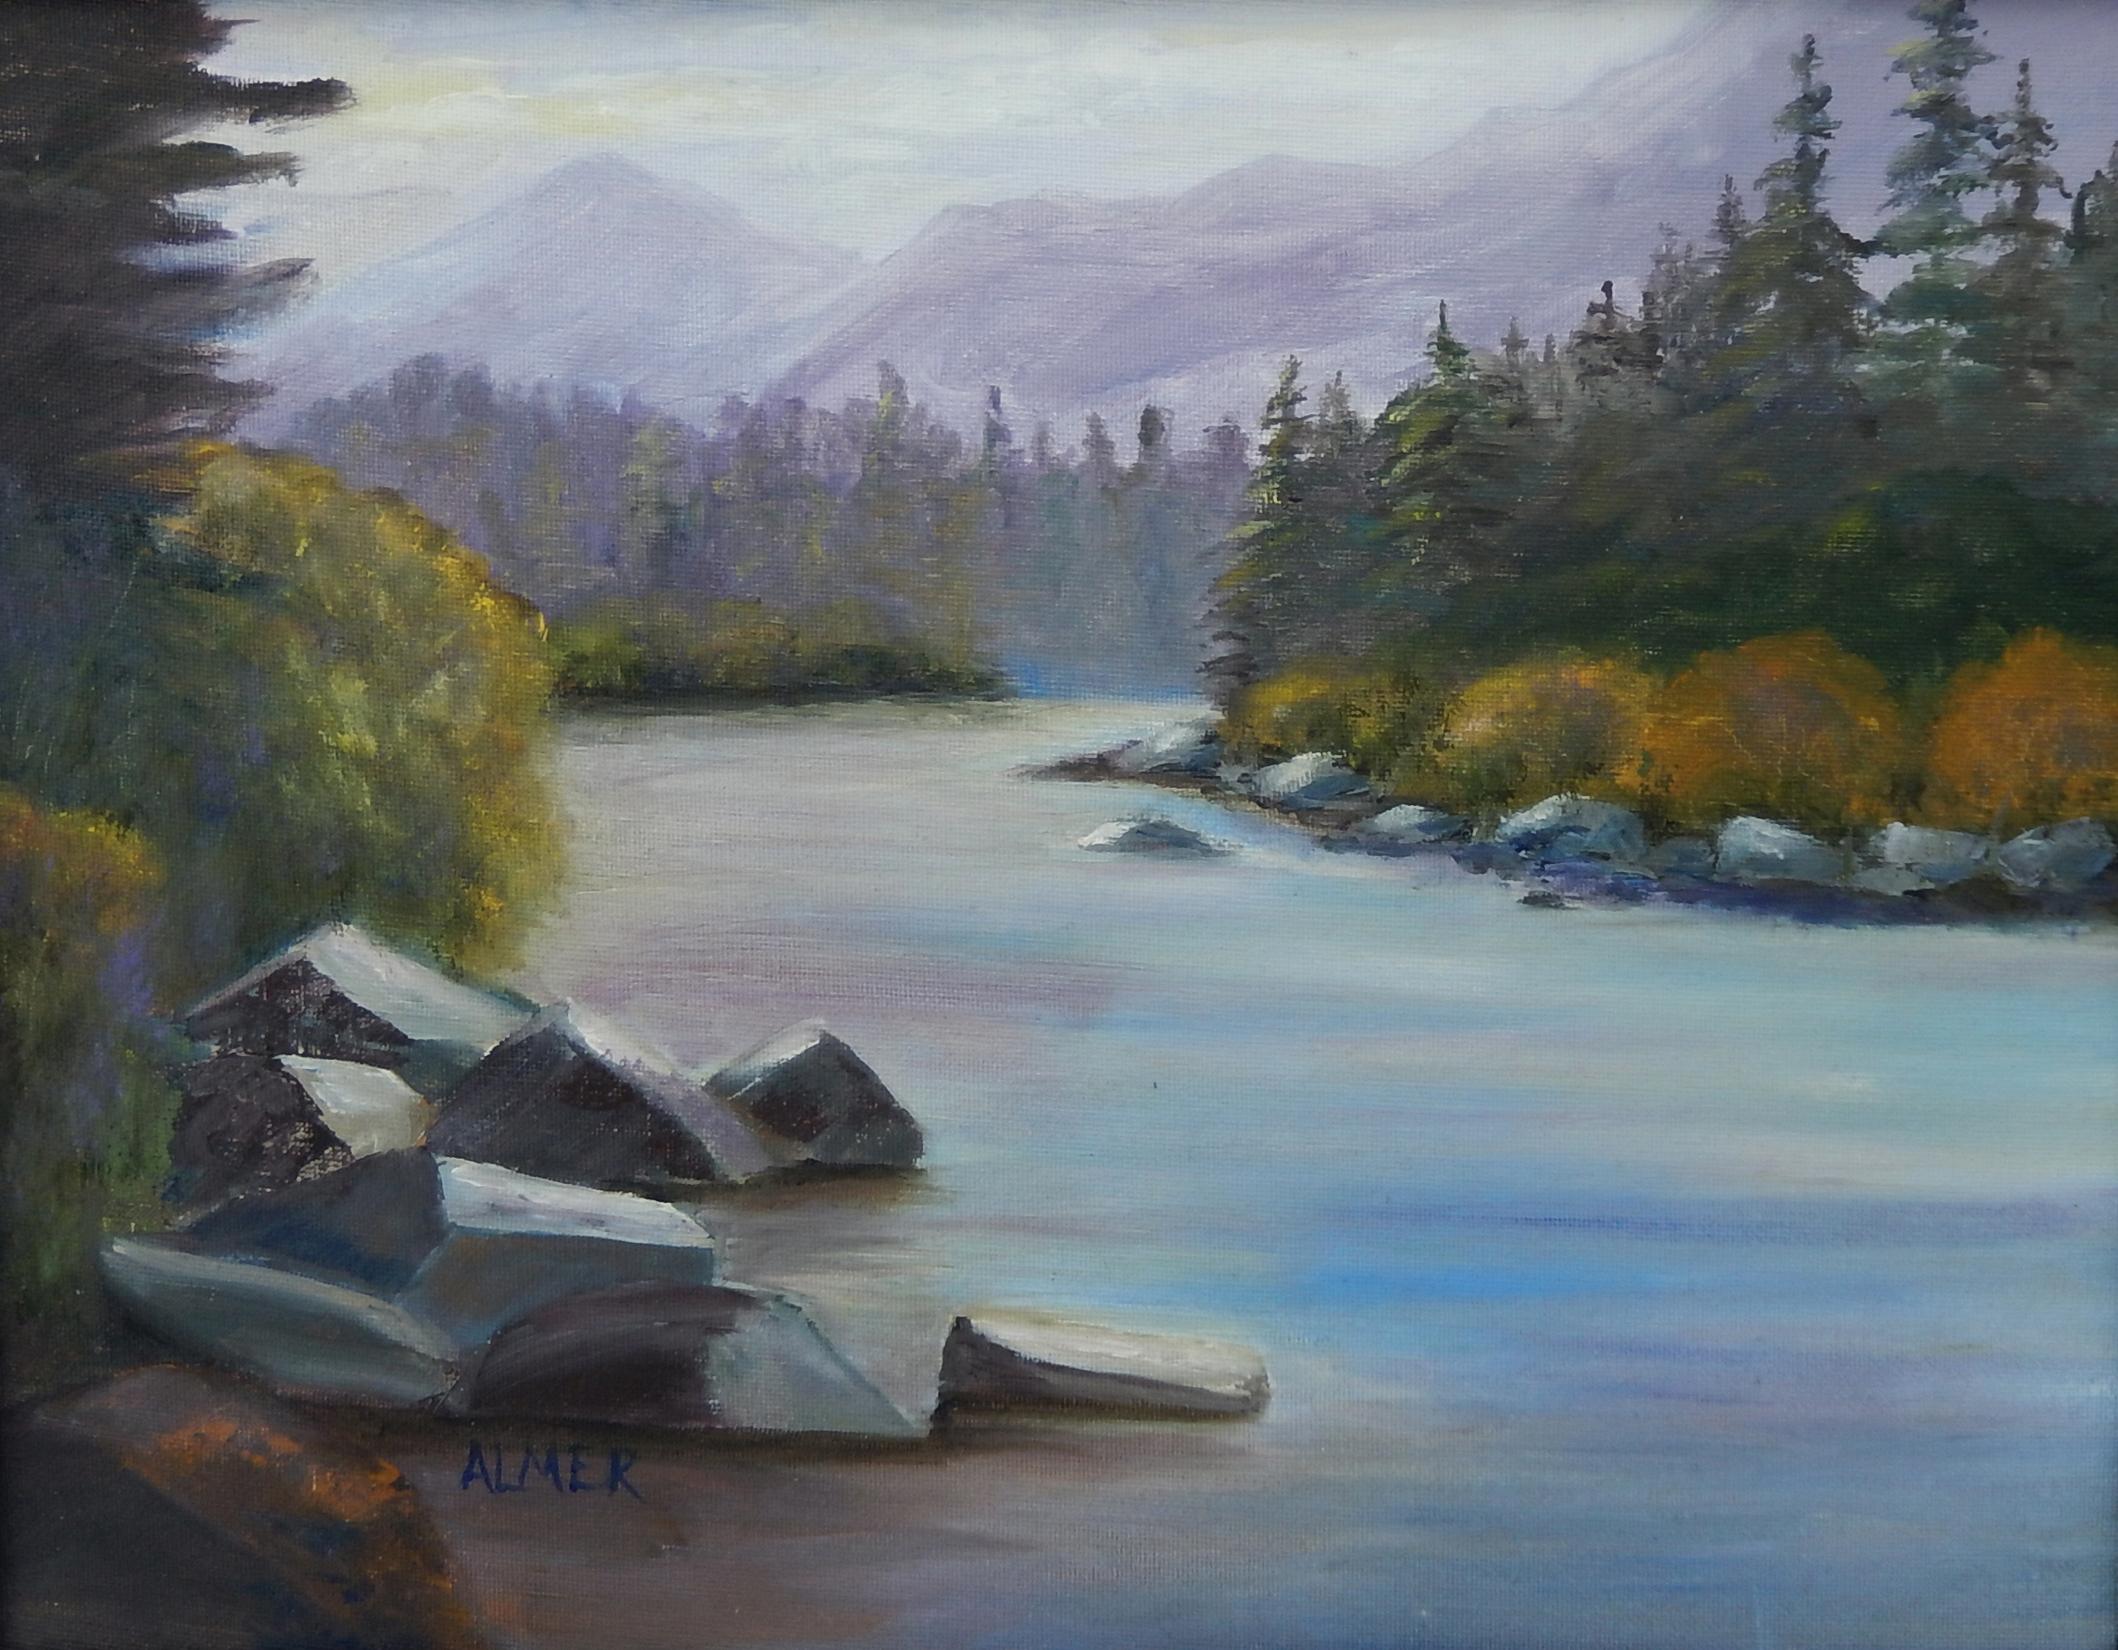 ALMER - 3 - Dawn on the Blackfoot